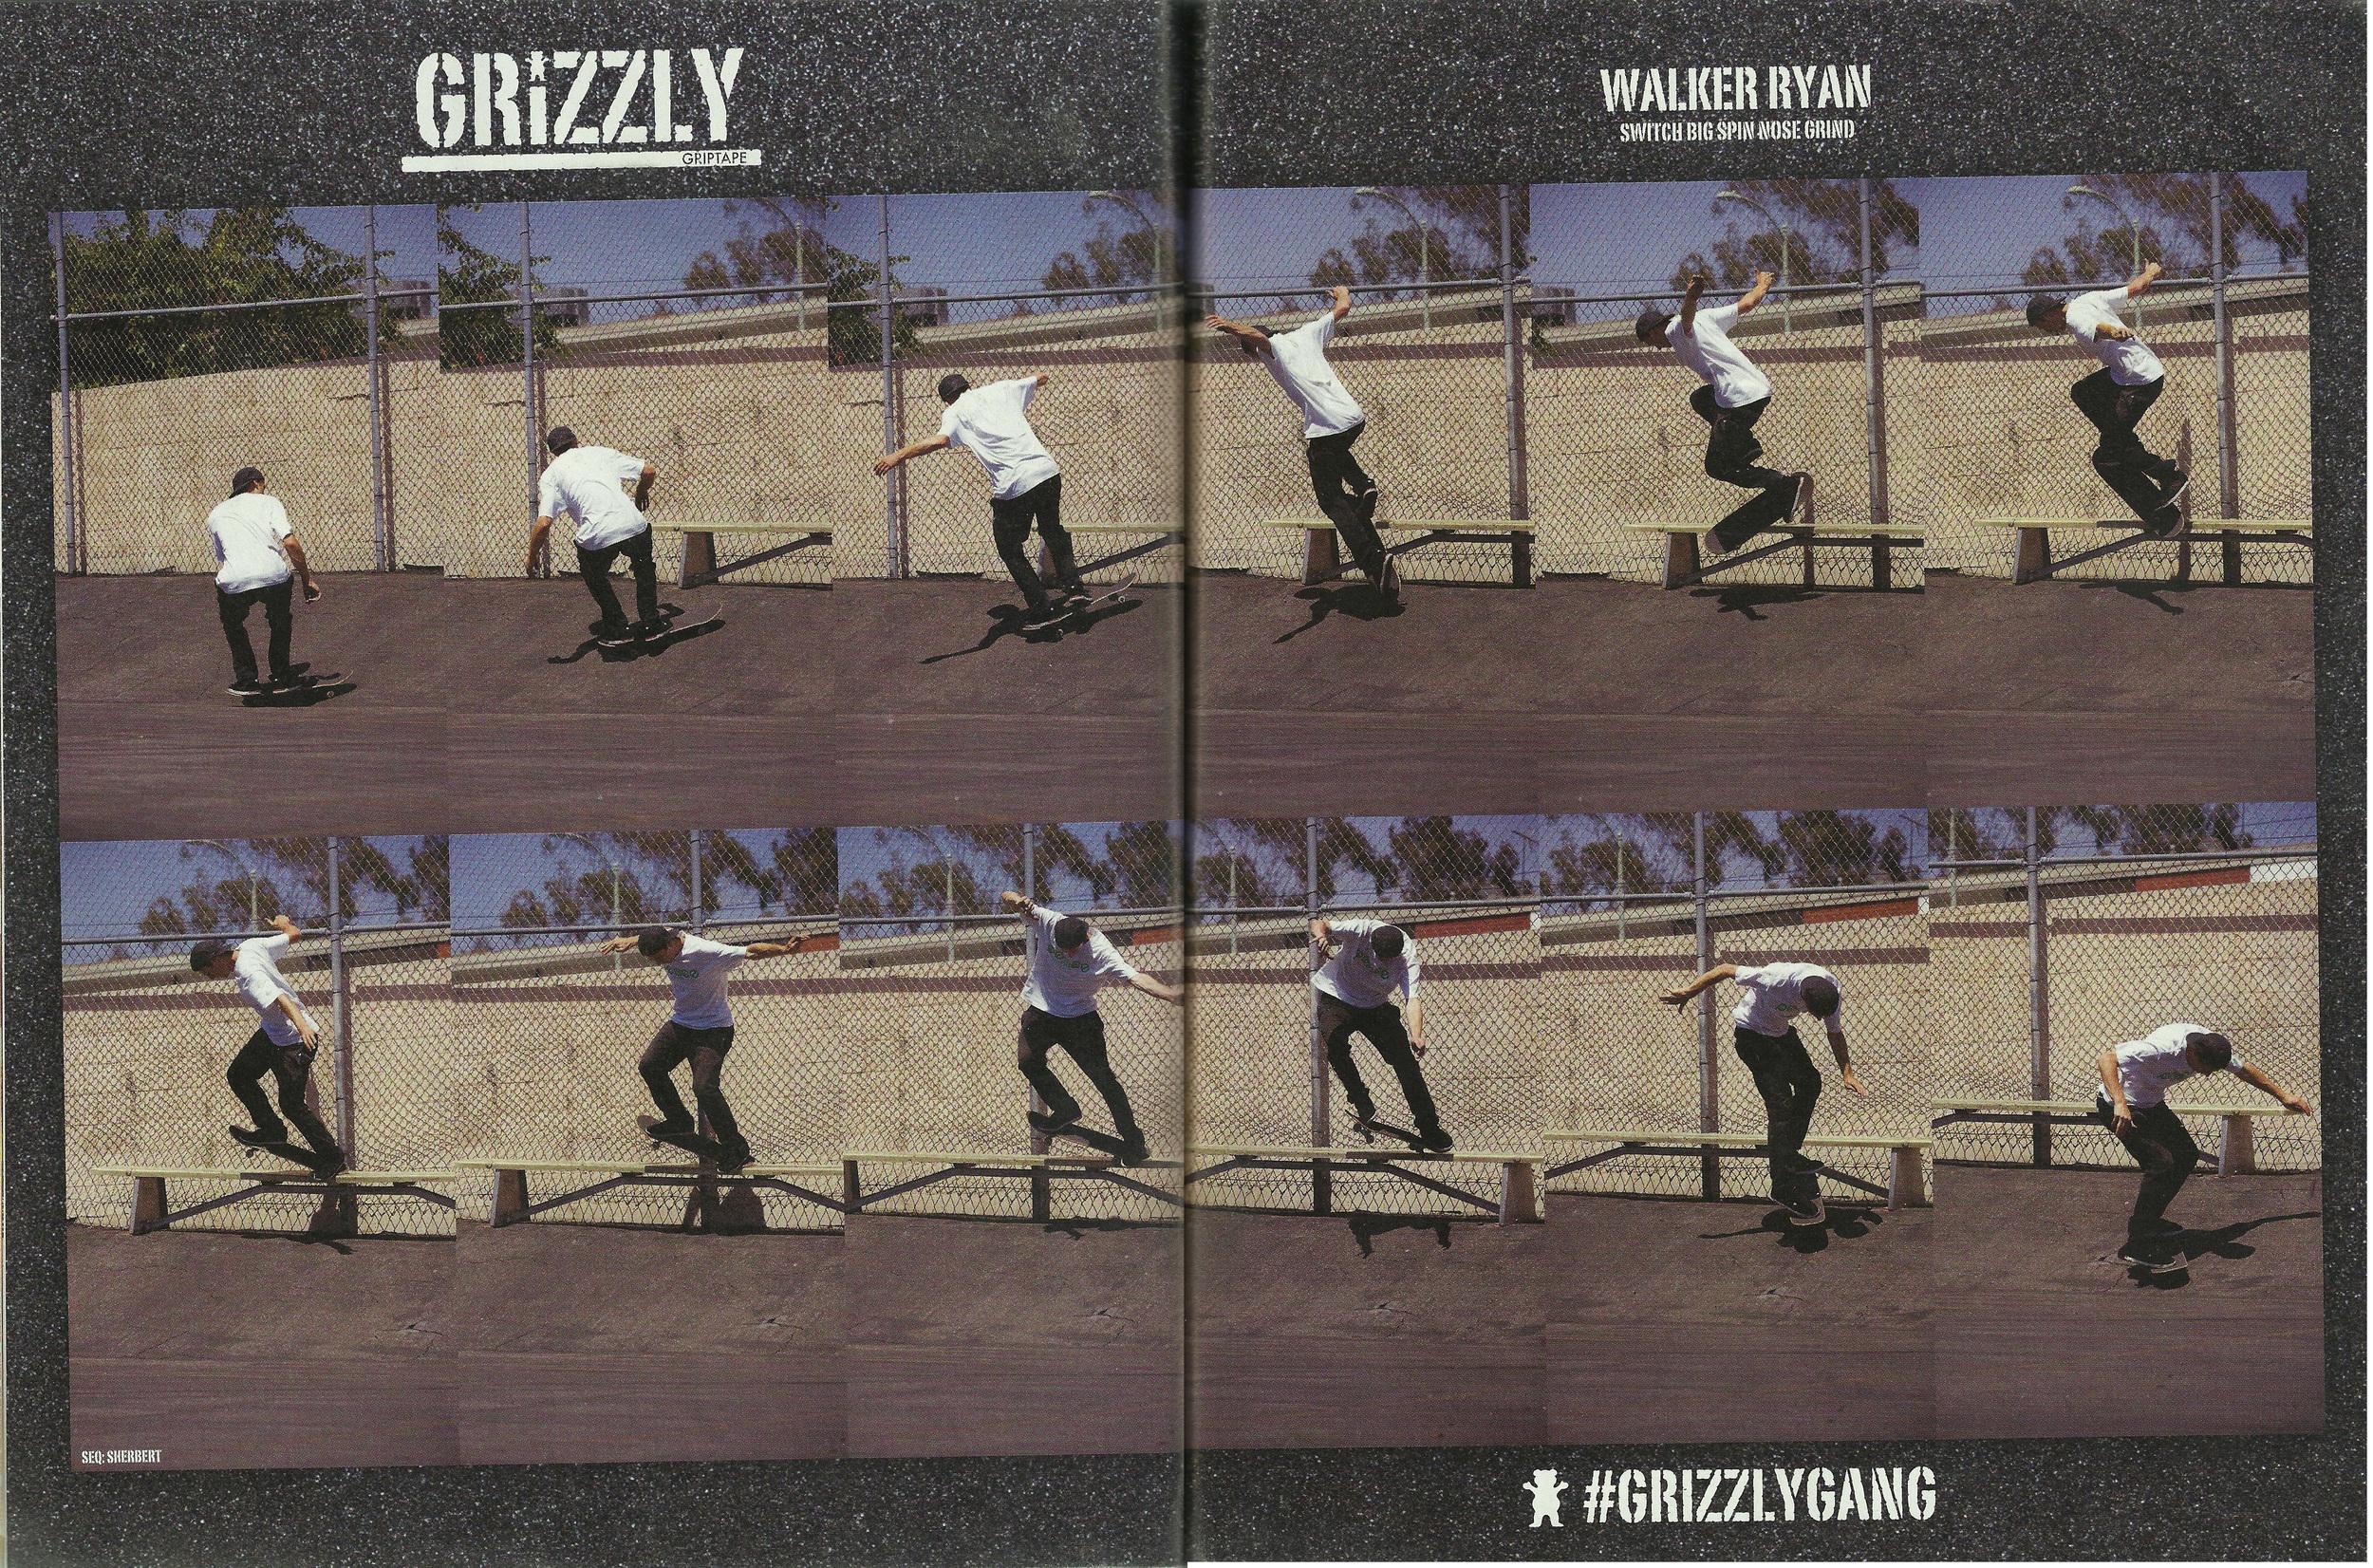 wr-grizzly ad thrasher 0413 copy.jpg